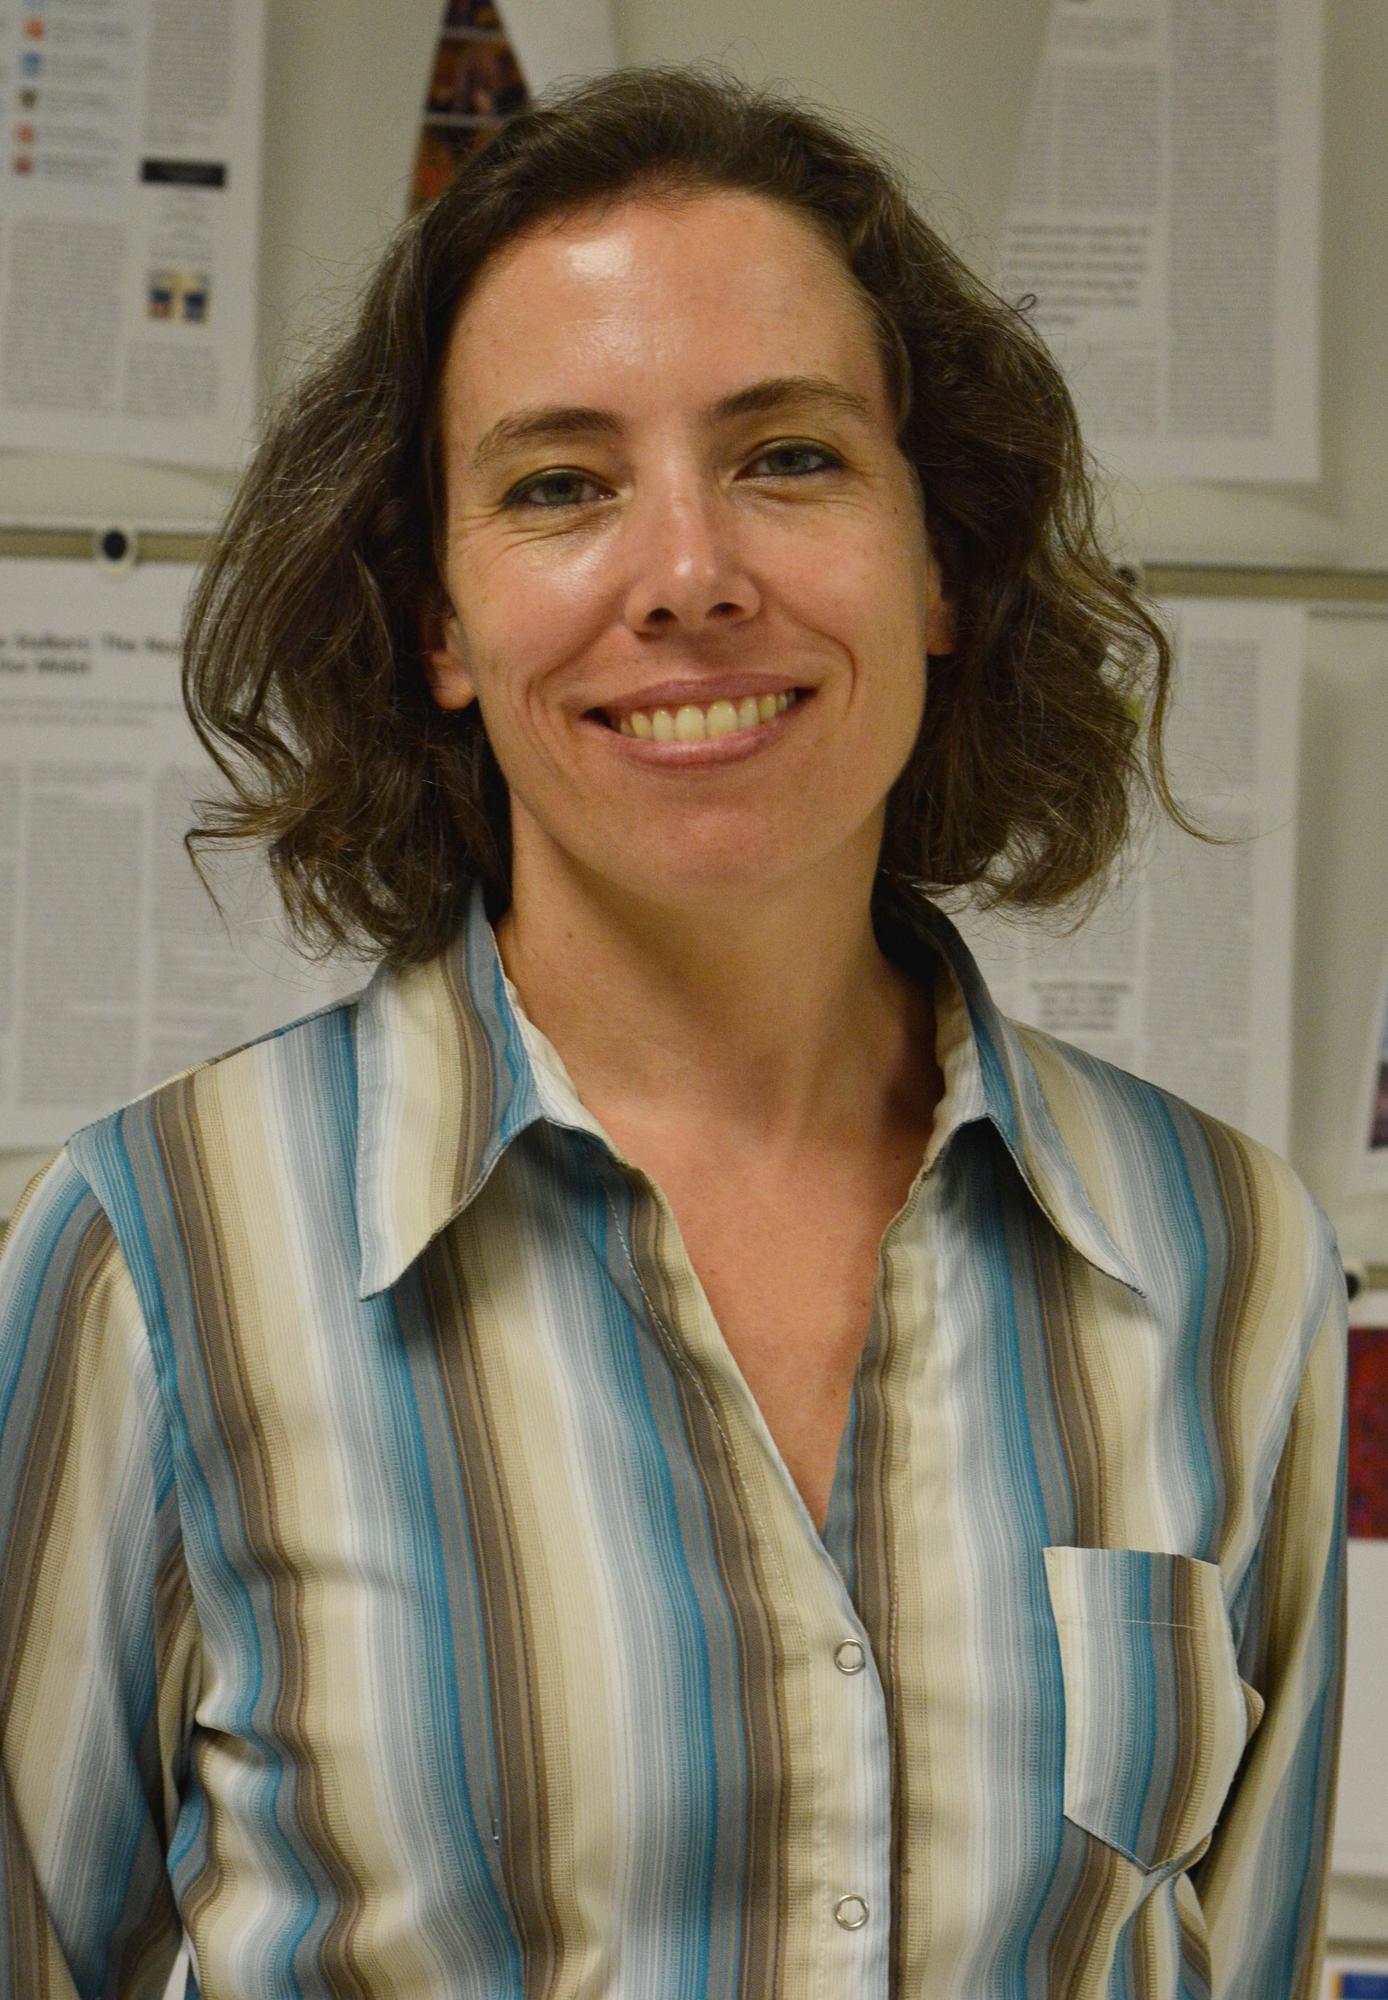 Fenella Saunders